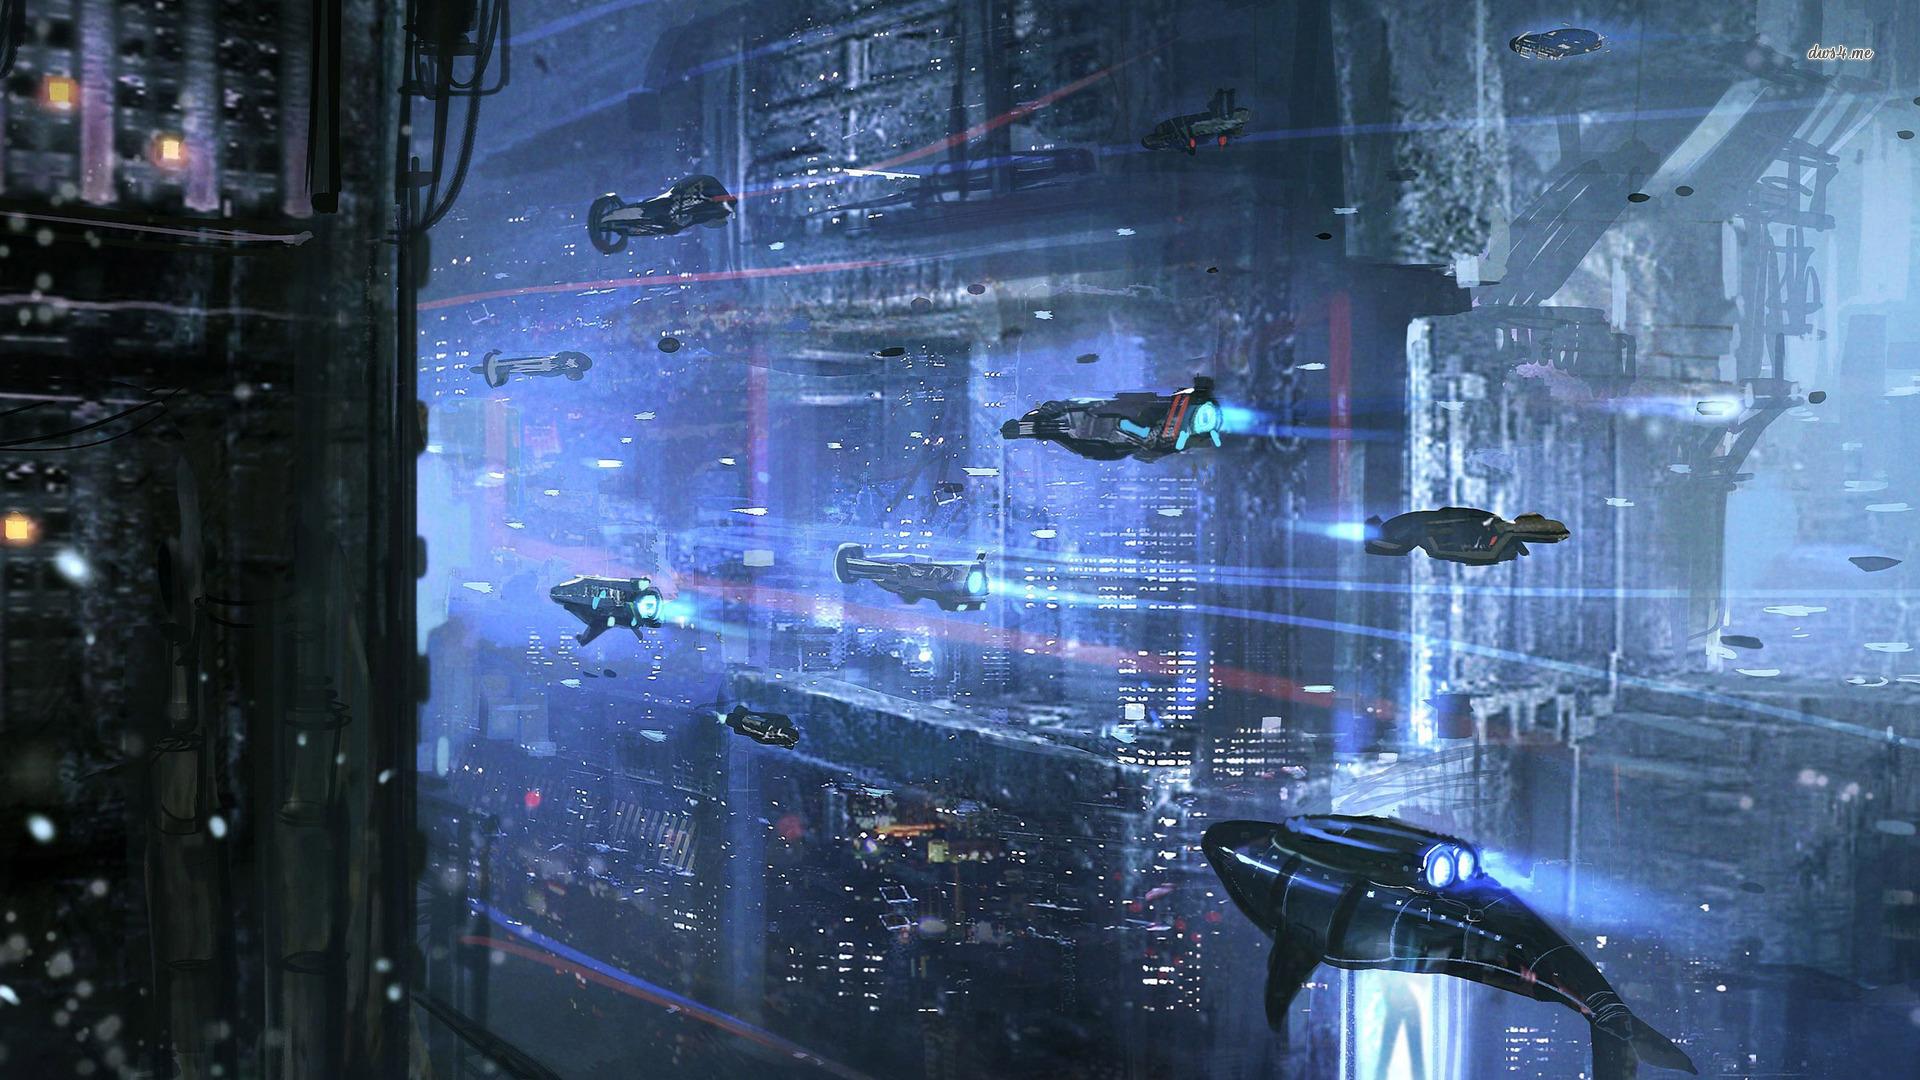 Cyberpunk Wallpaper HD 1920x1080 1920x1080